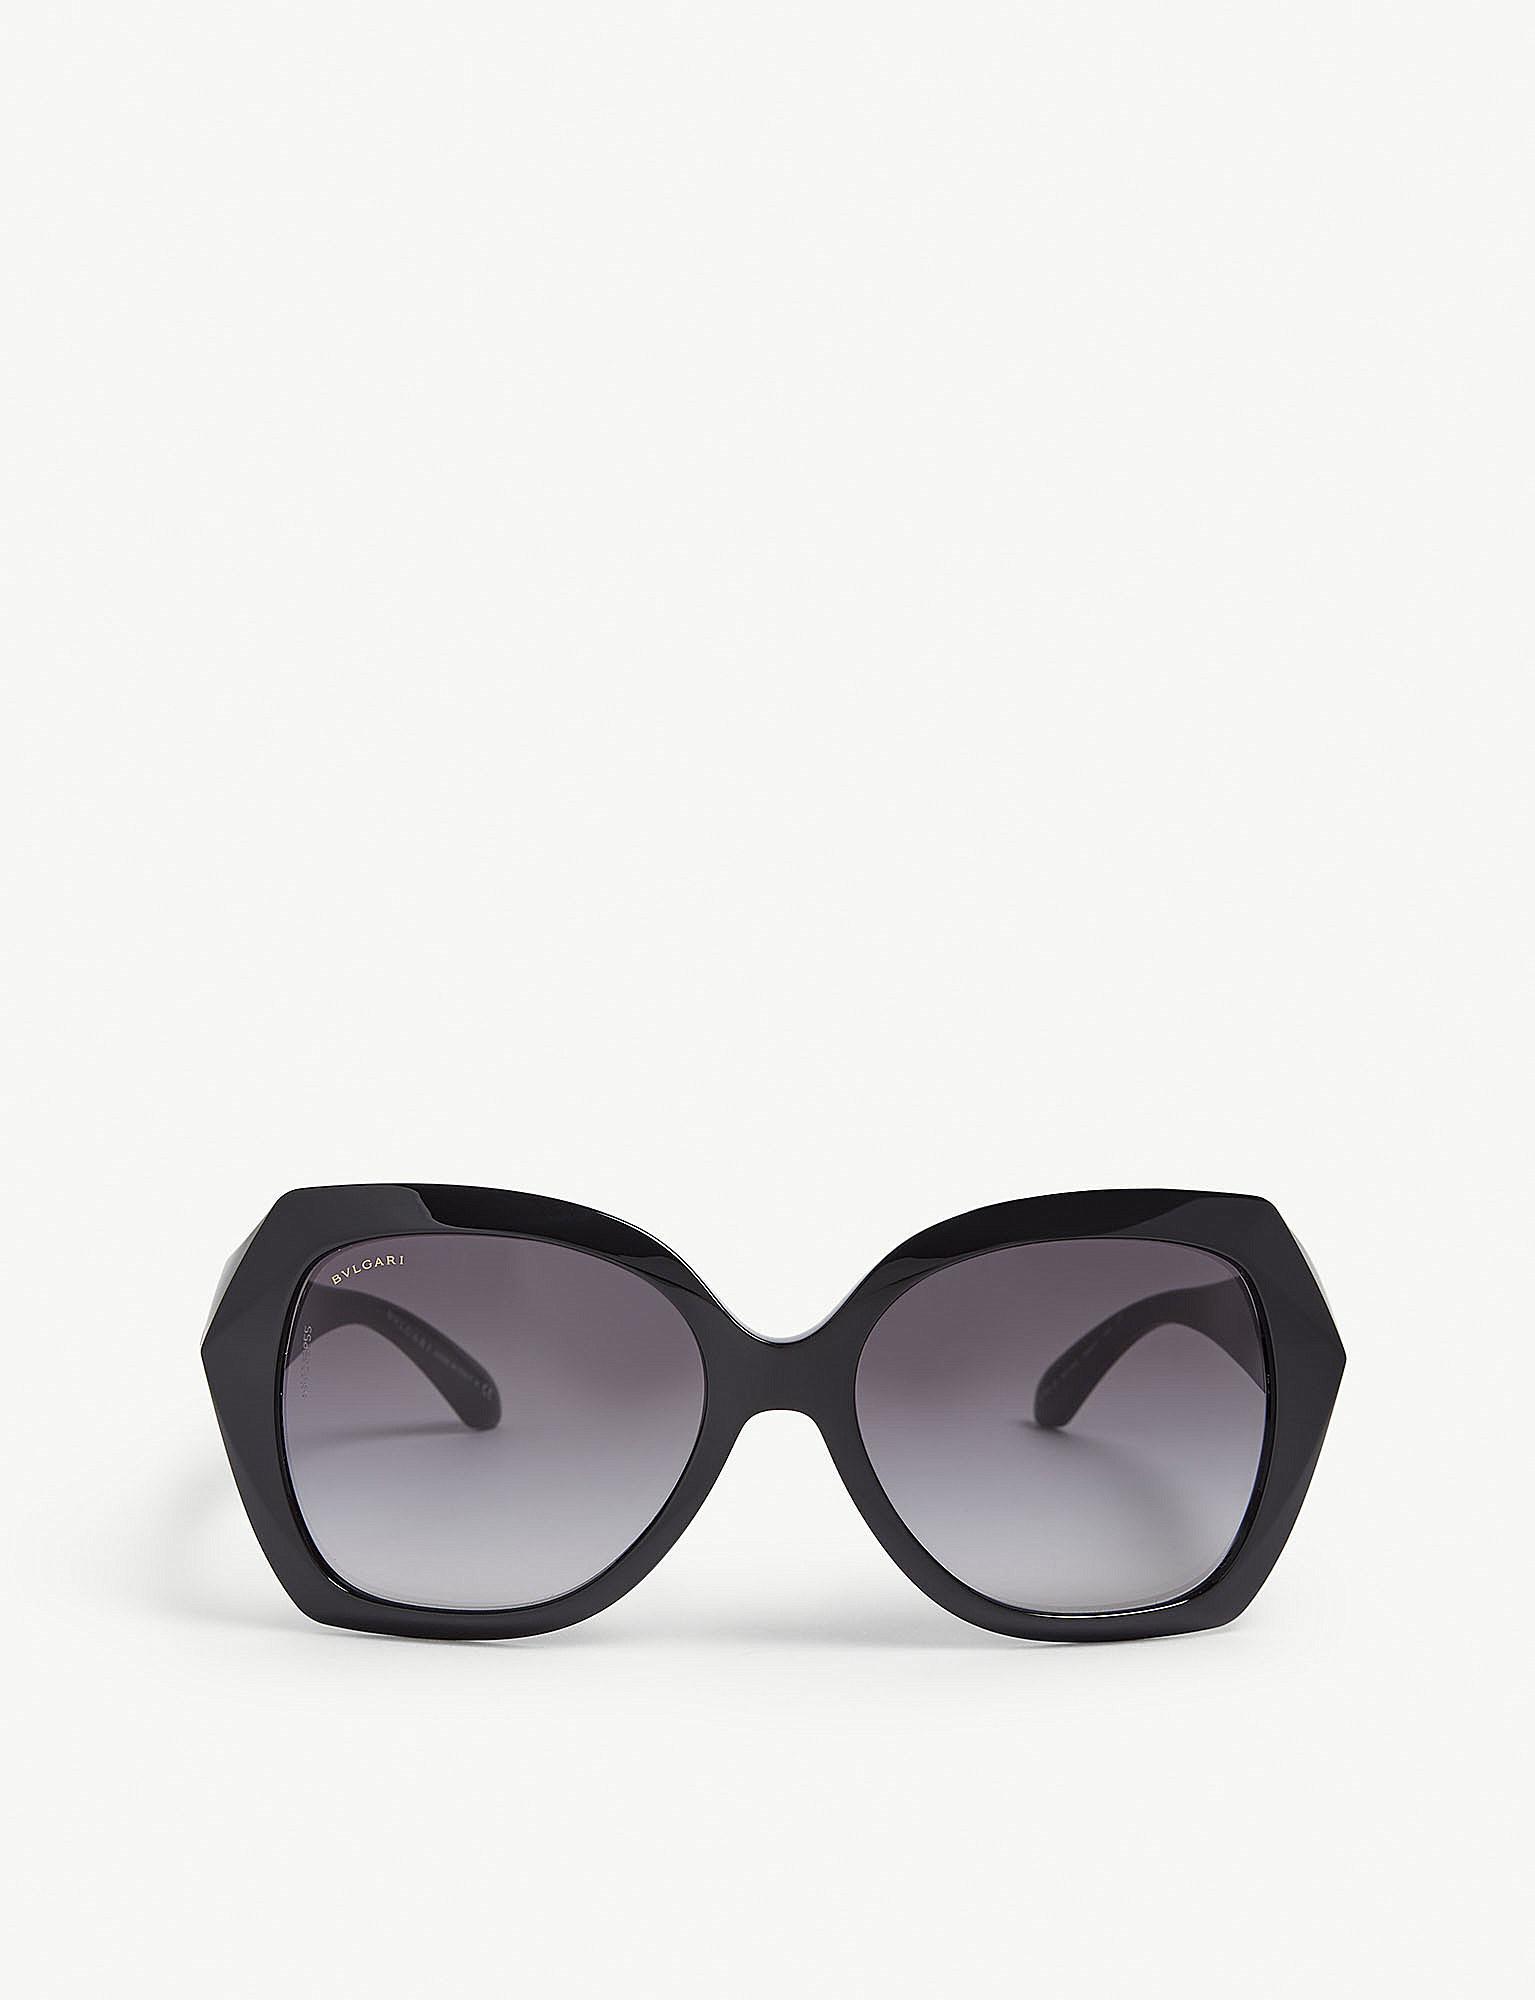 f6638781bc Bvlgari Black Bv8182b Square Sunglasses in Black - Lyst